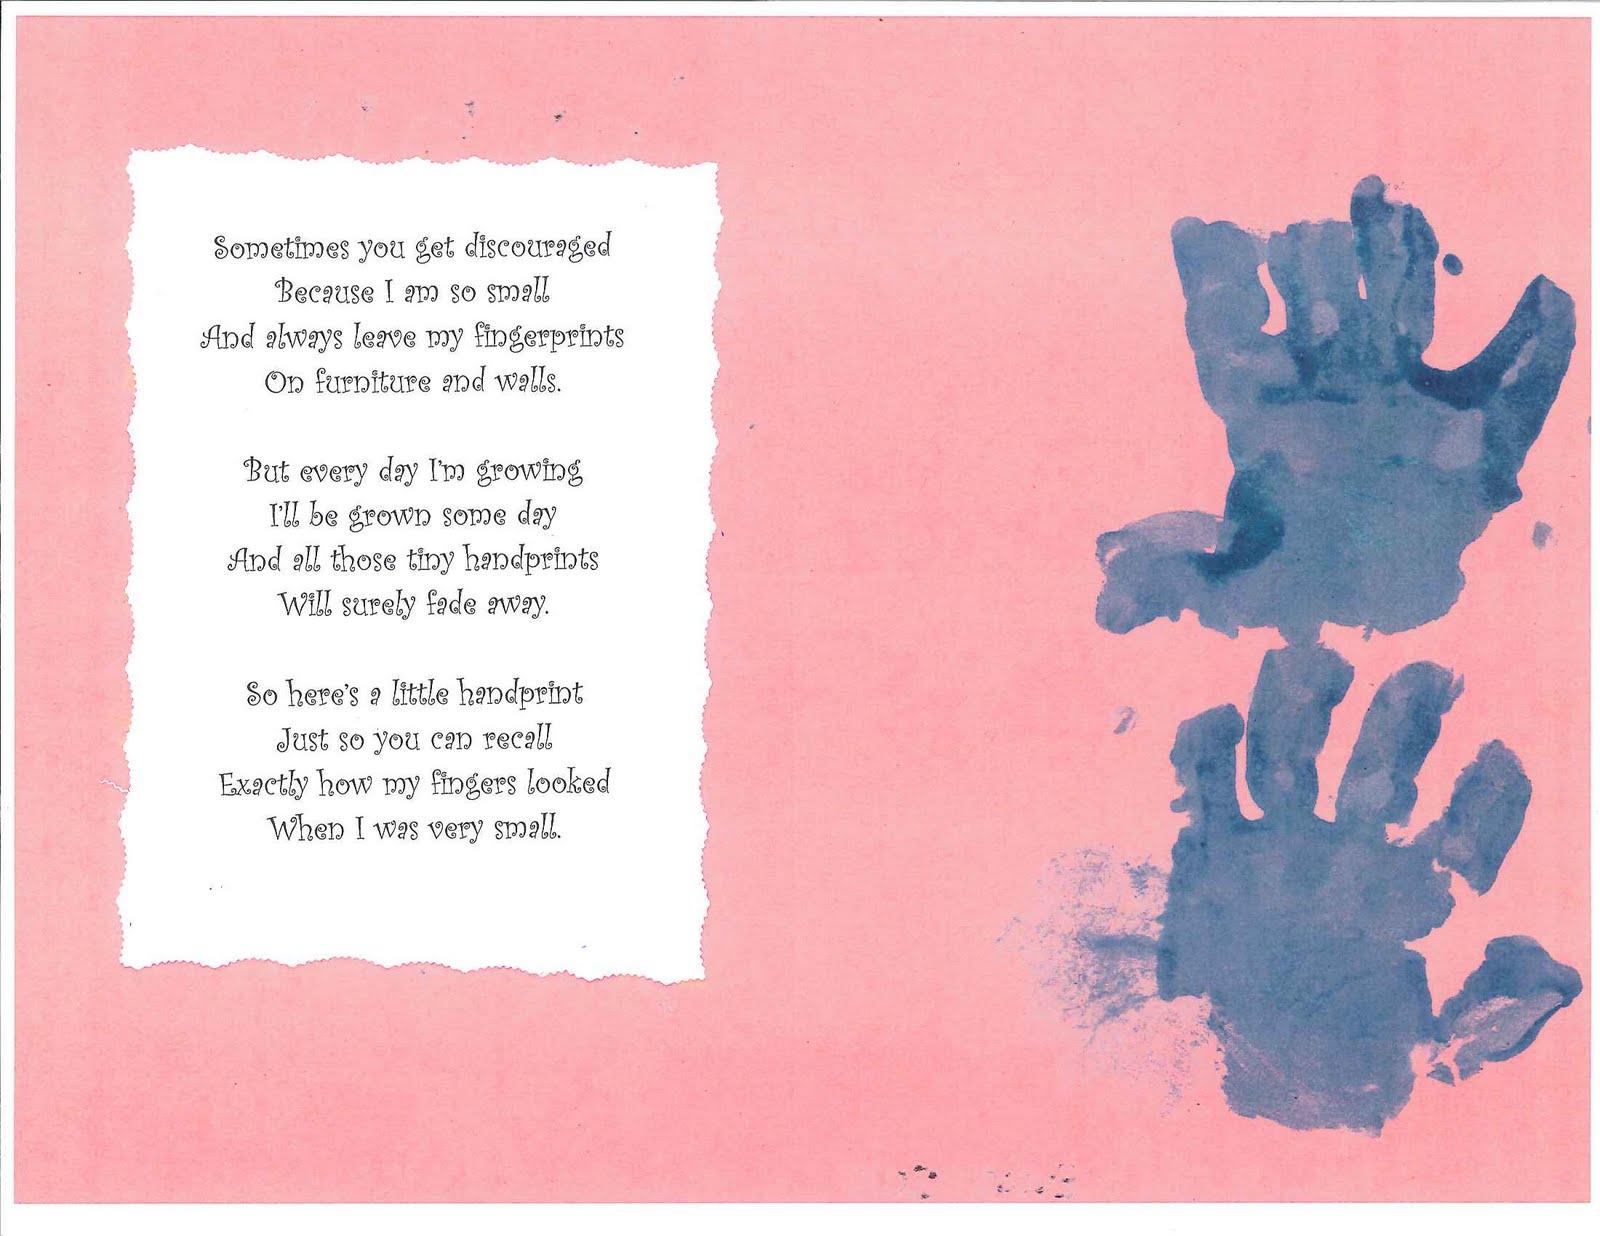 Mothers Day Handprint Poem. Handprint Poems For Grandparents Templates ...